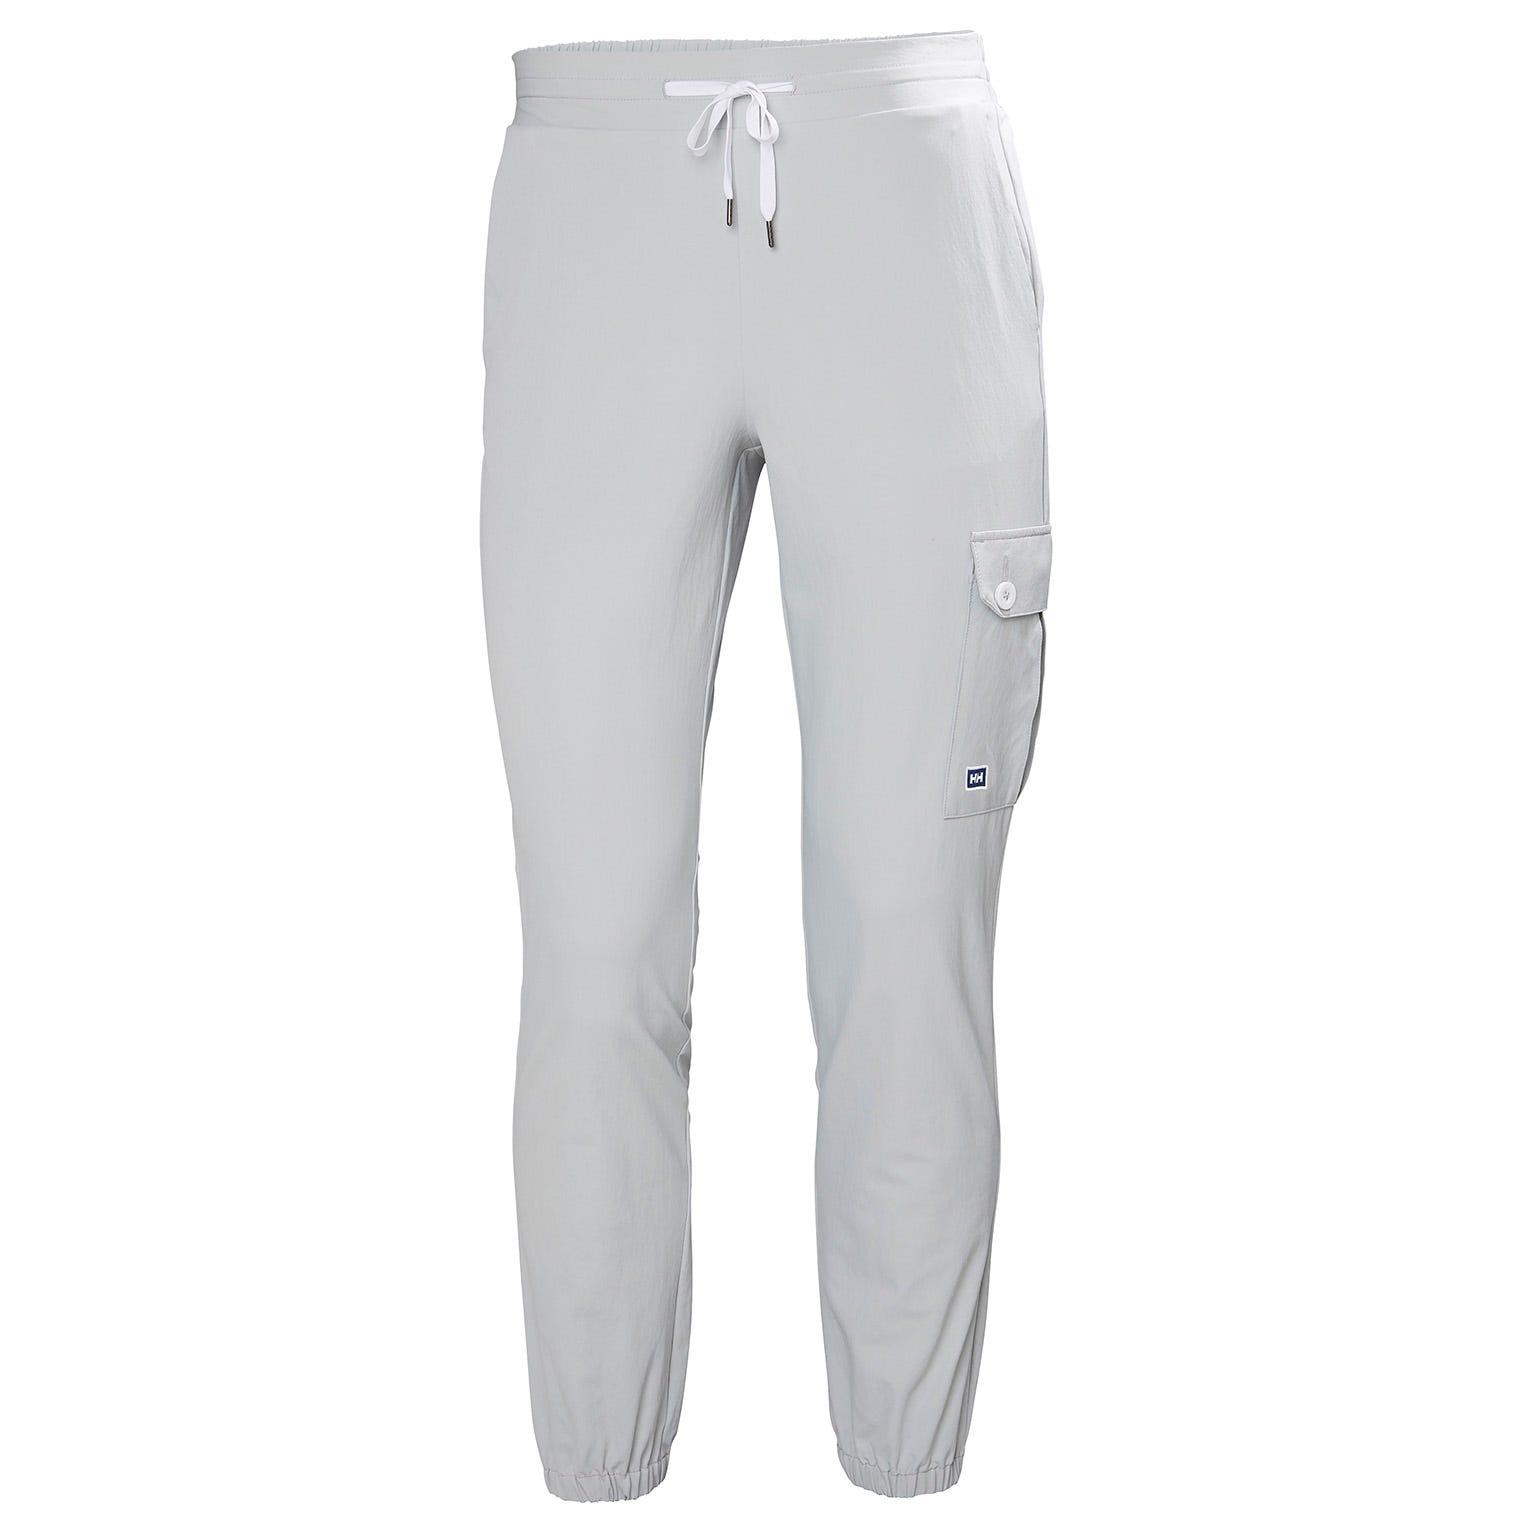 Helly Hansen W Campfire Pants Womens Hiking Pant Grey M